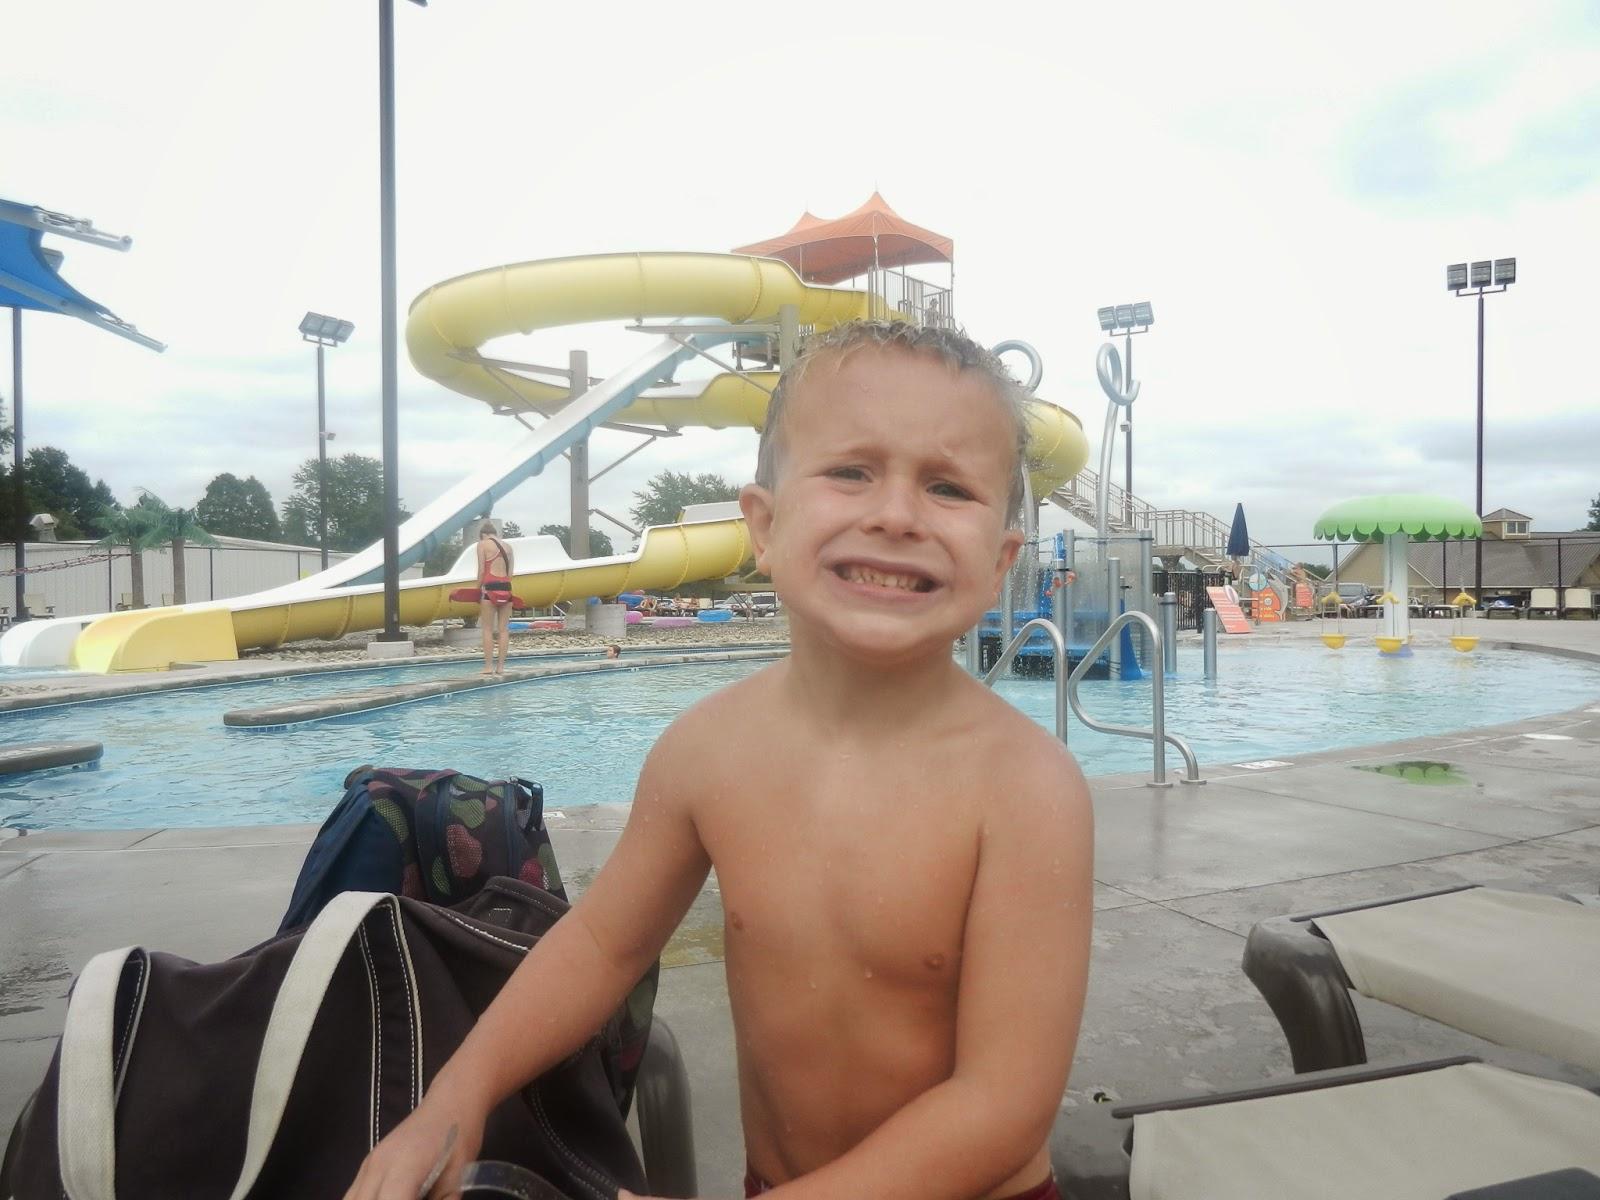 The kerrie show belton pool thanks tutu for Pool show 2014